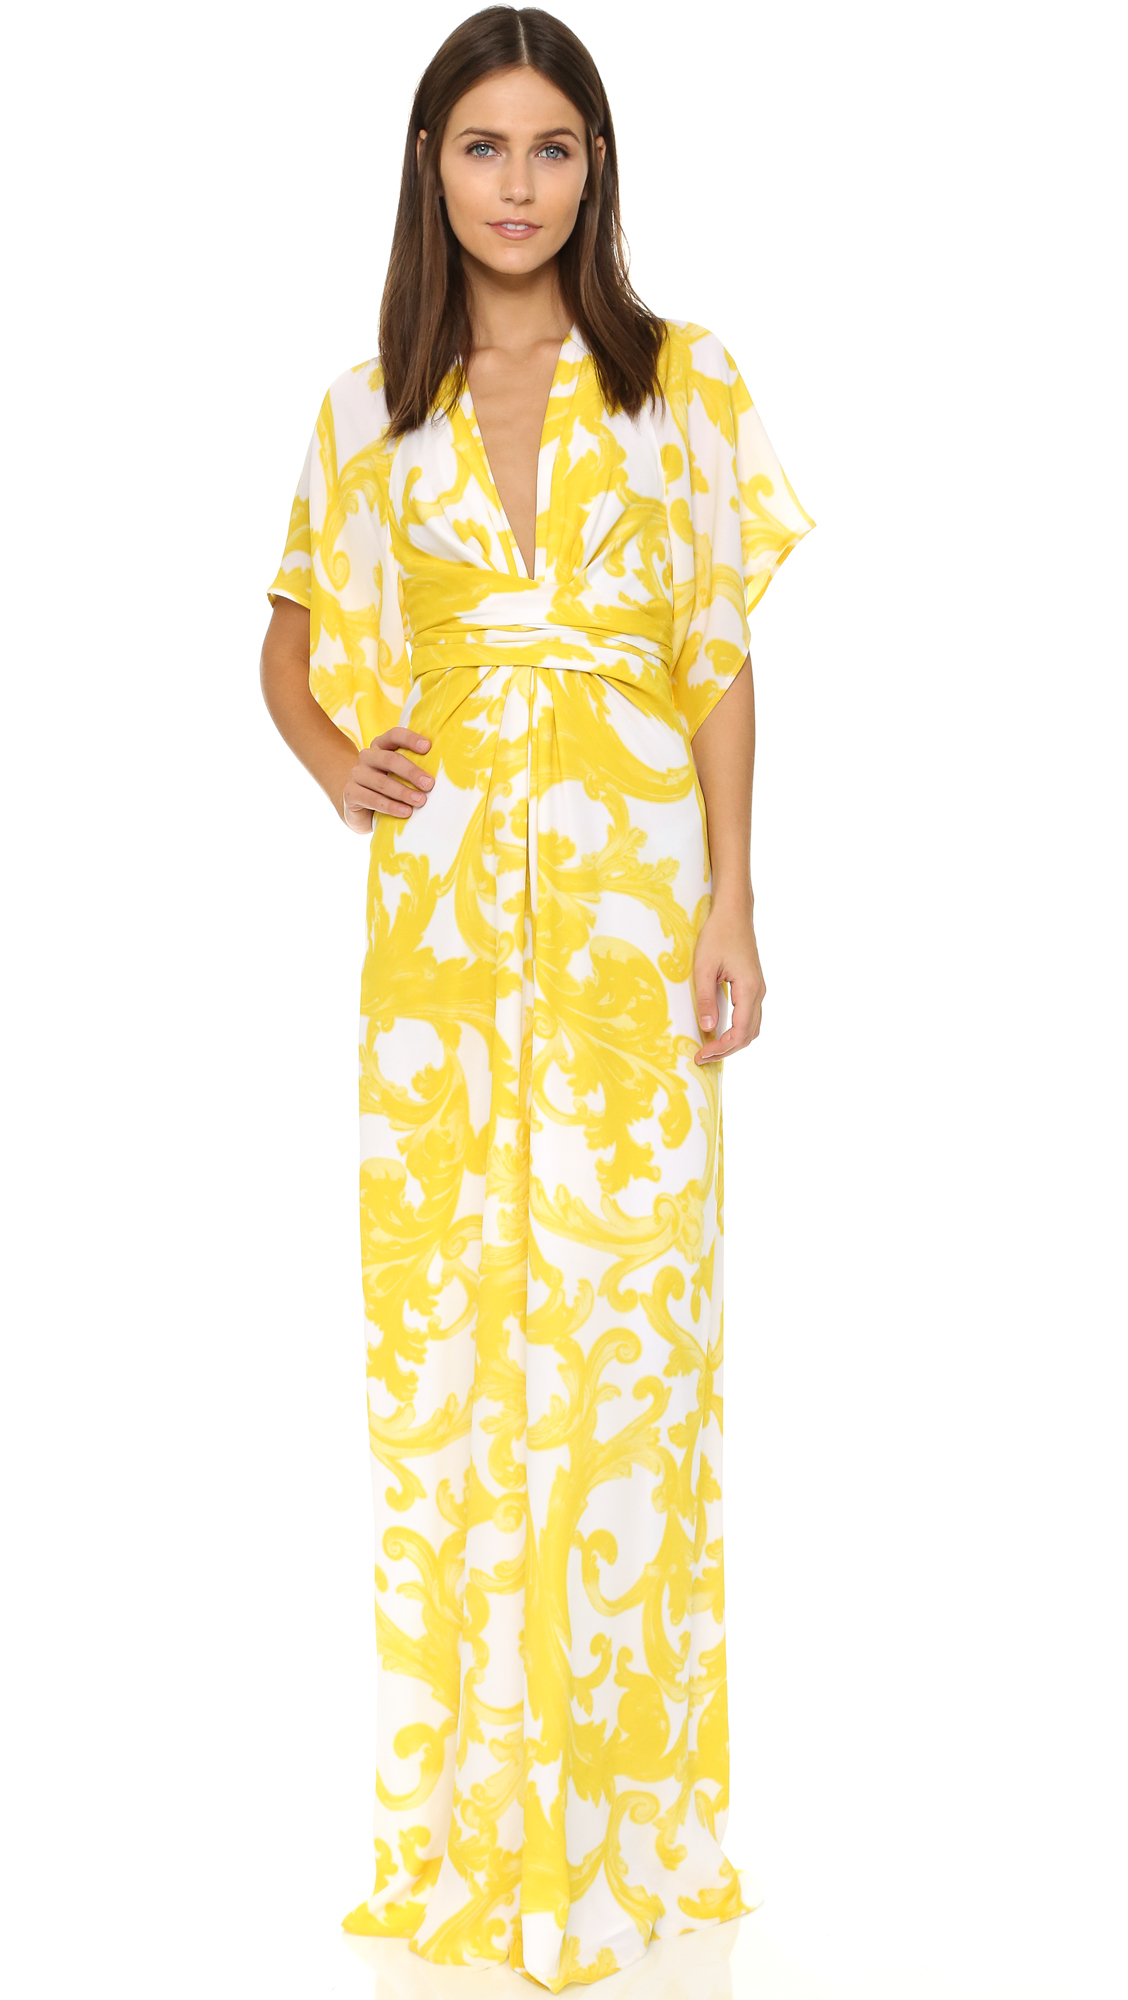 Issa Pollyanna Maxi Dress in Yellow   Lyst